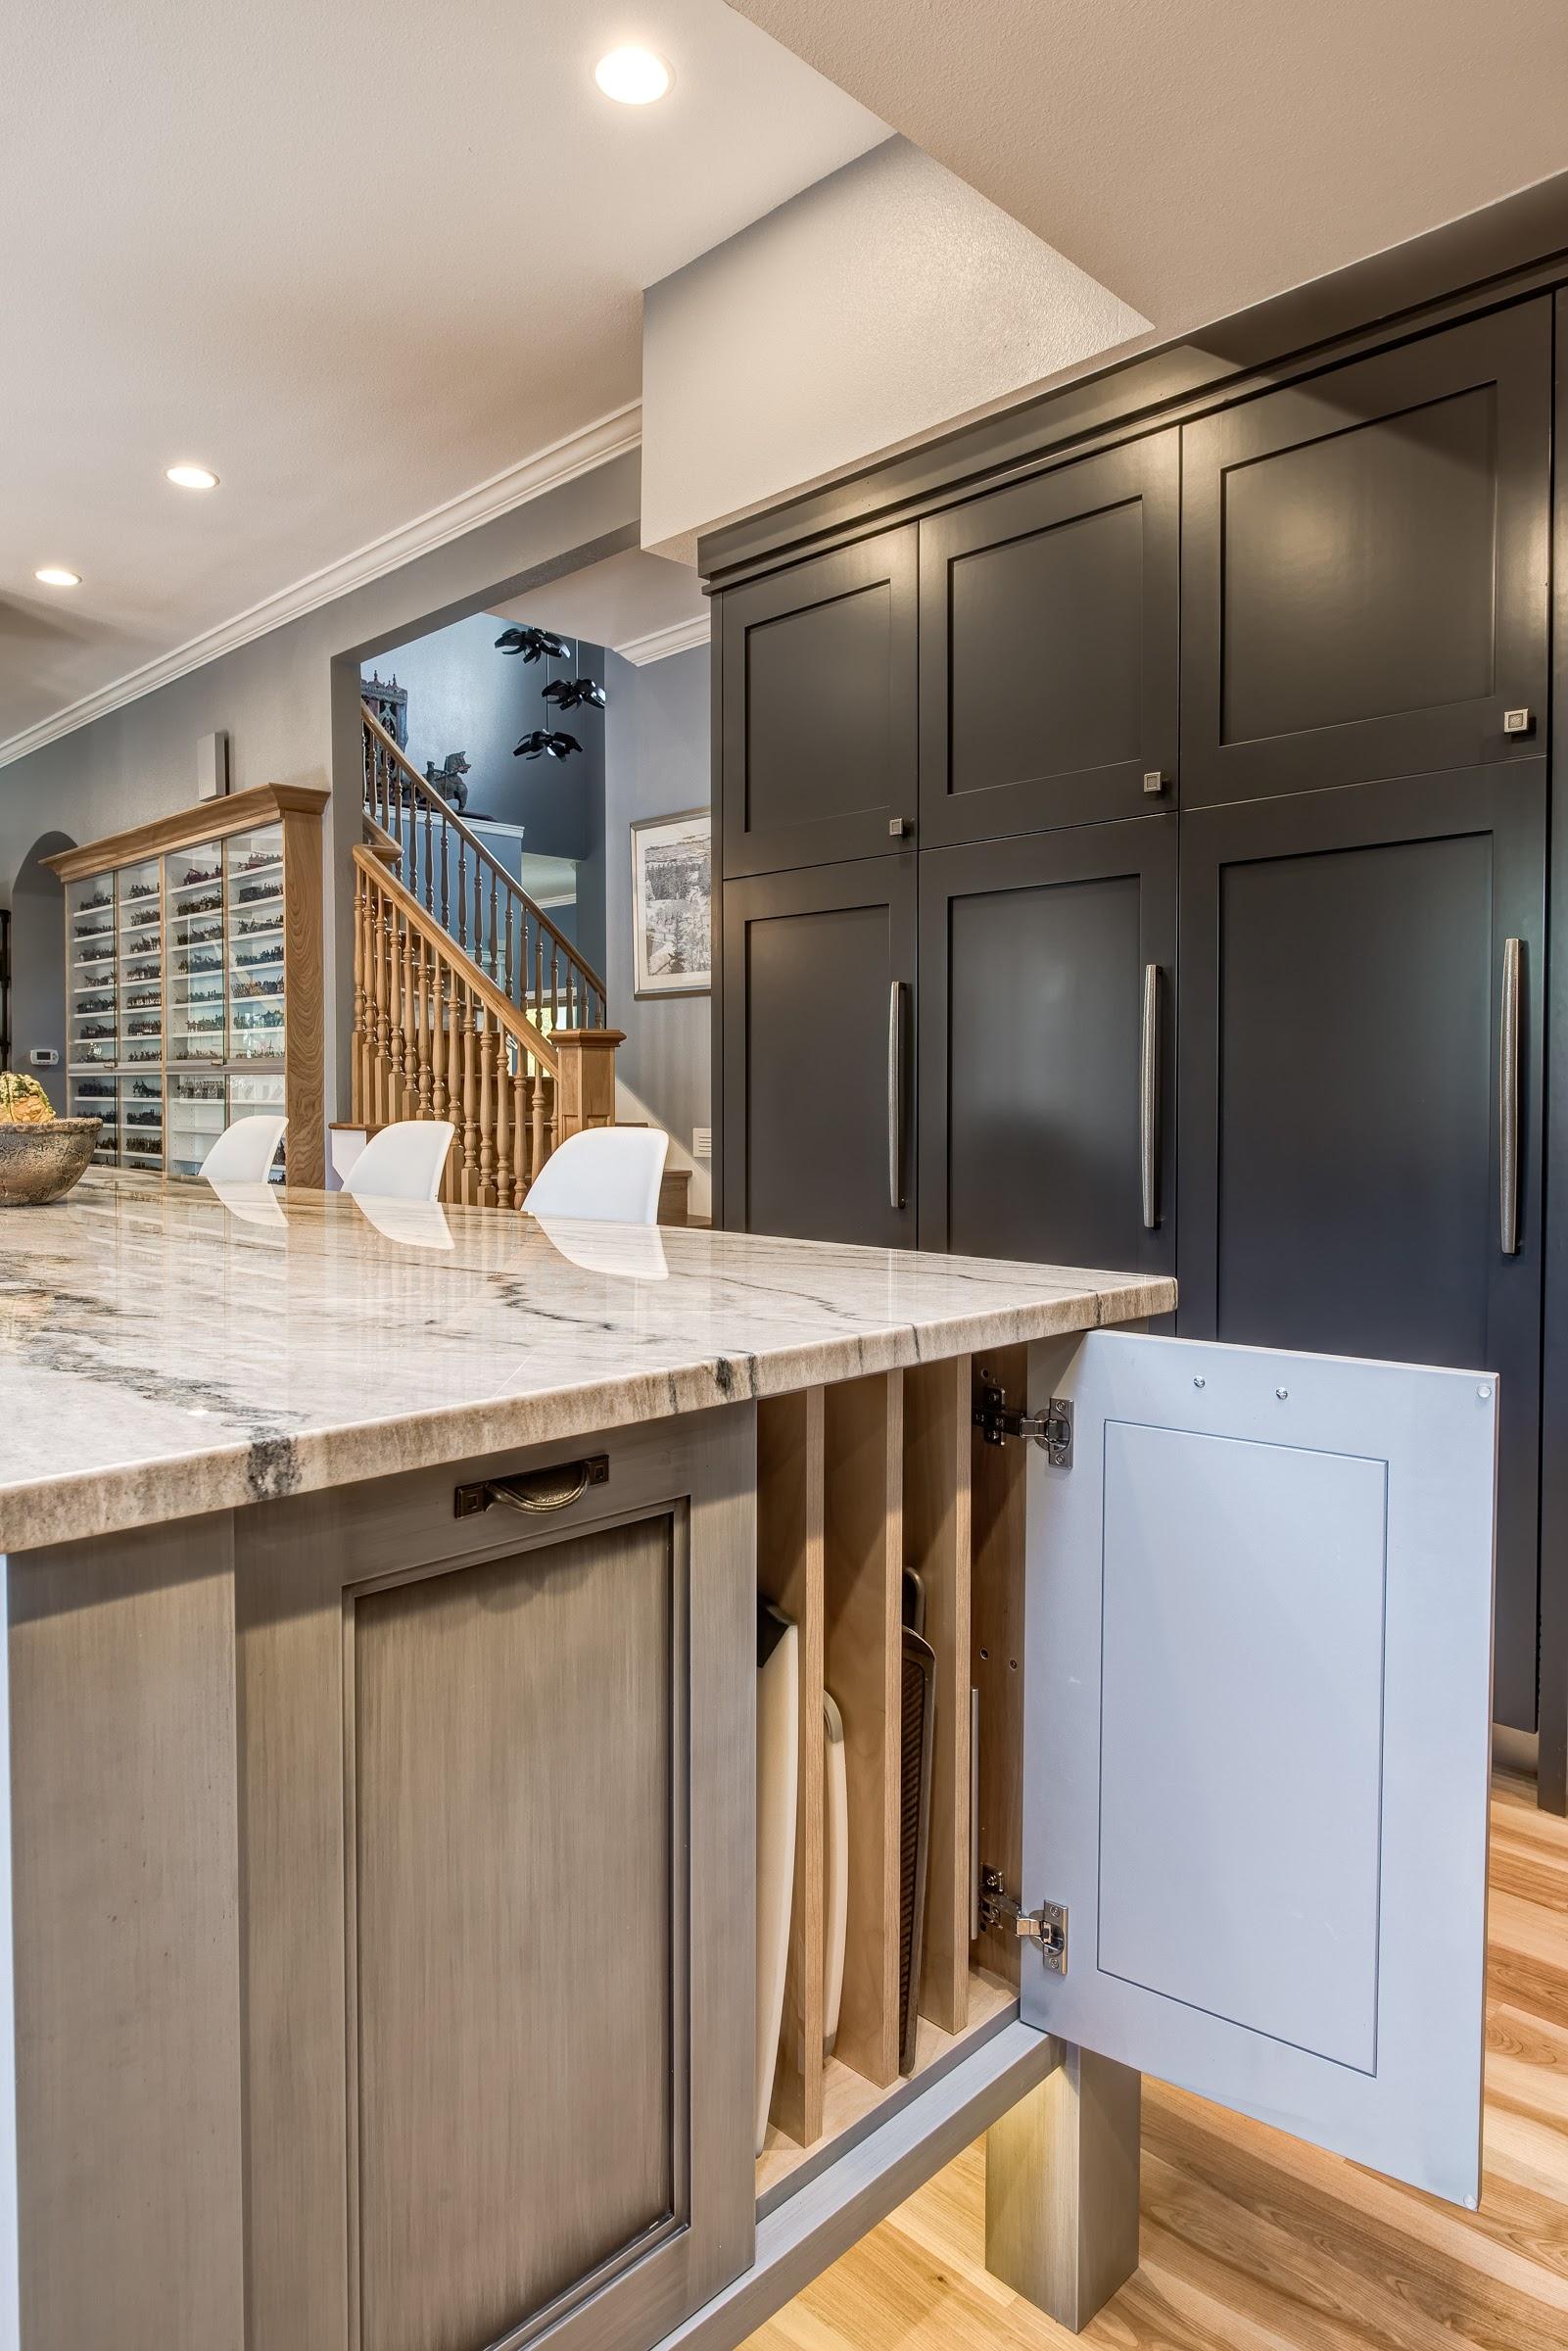 Project Vinca Ct. Craftsman - Kitchen View 7